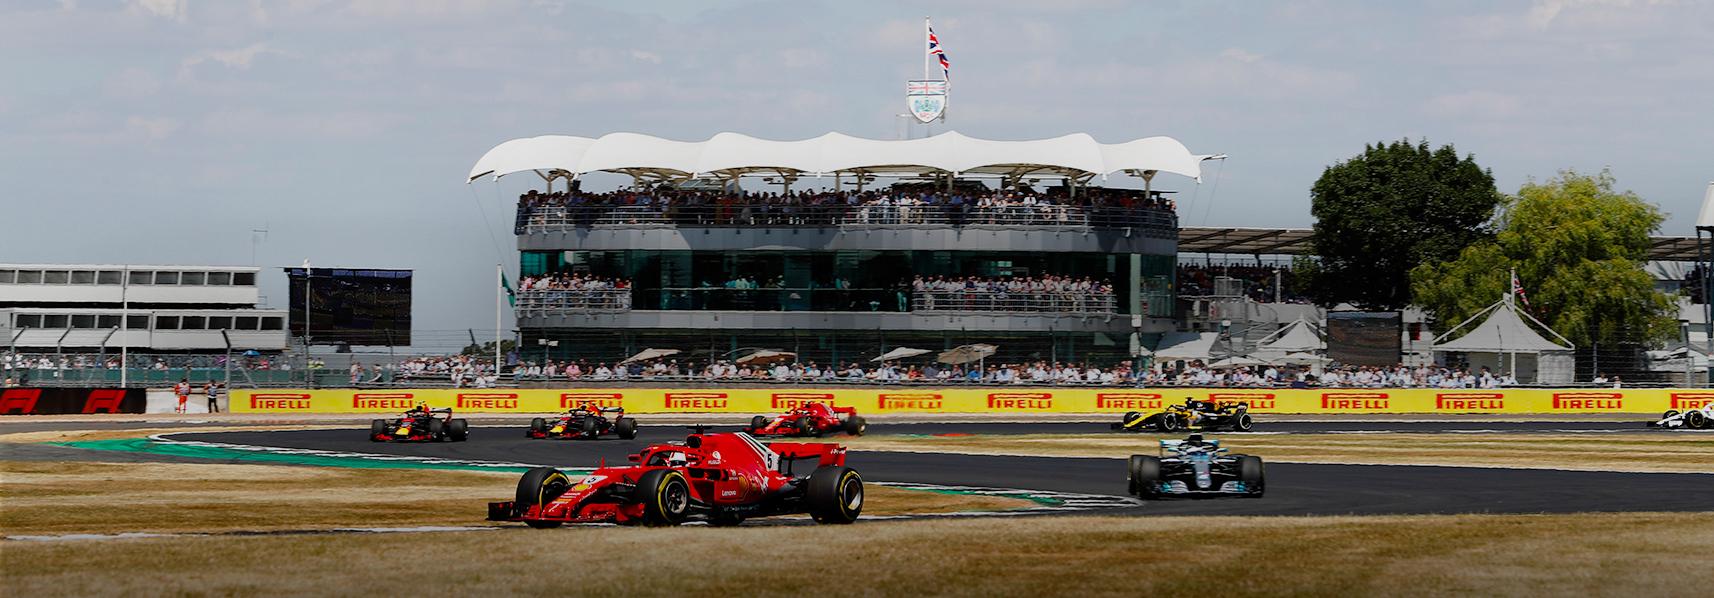 Rolex British Grand Prix